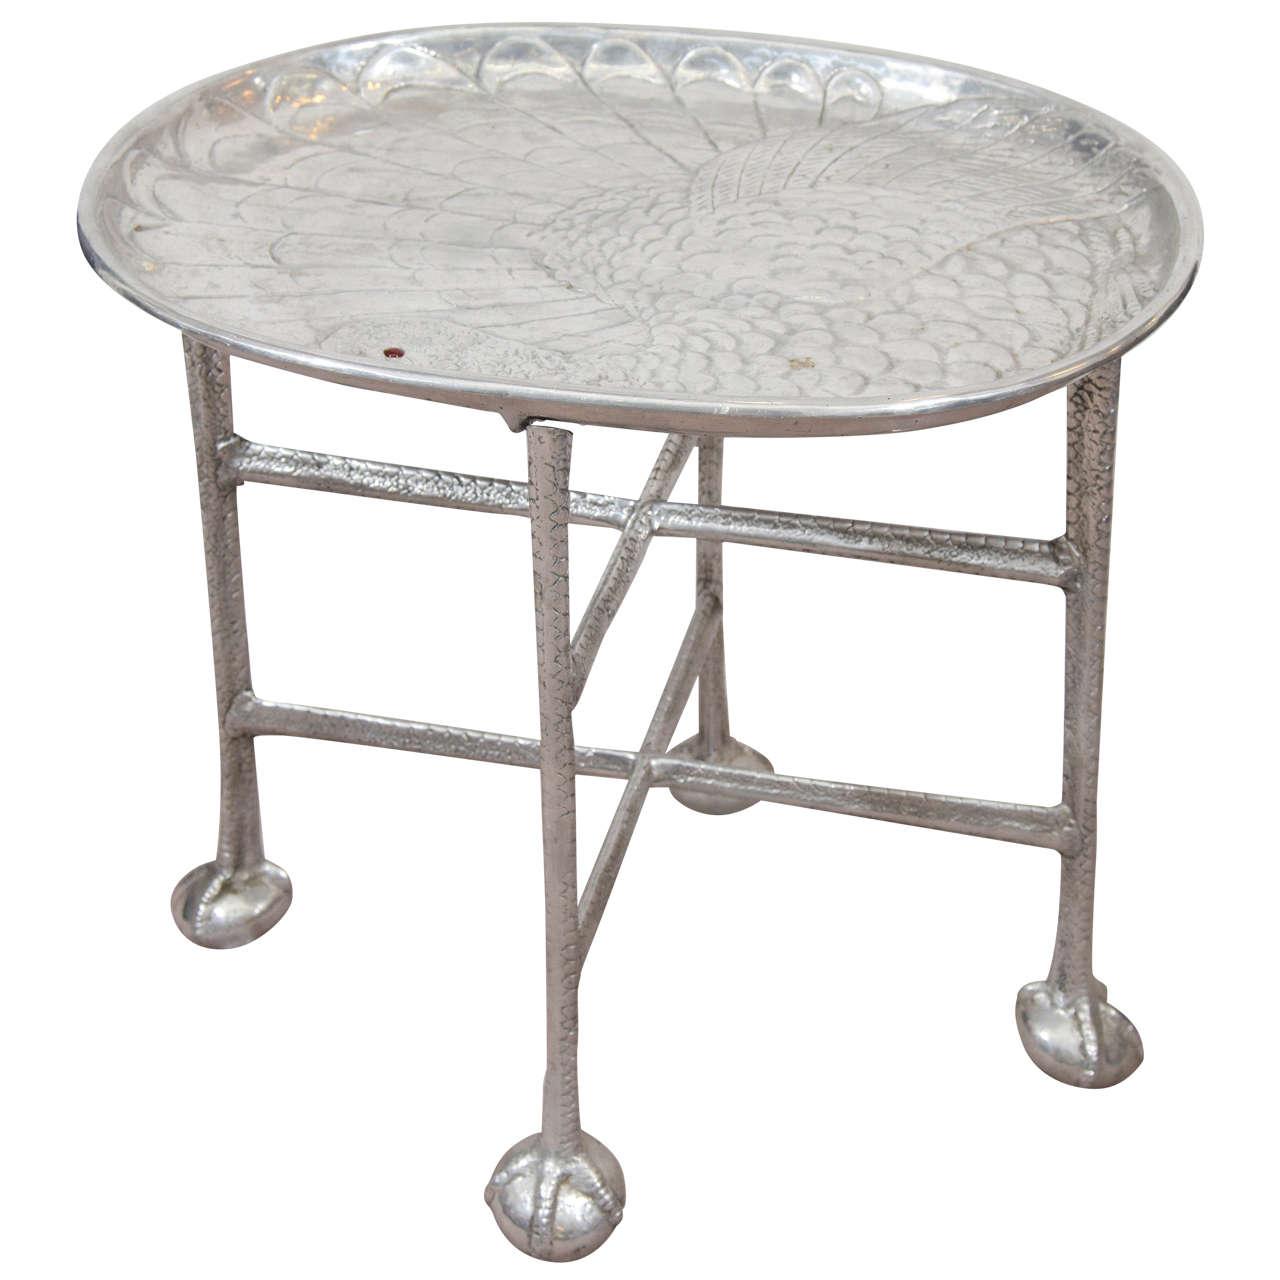 Arthur Court Aluminum Platter on Stand For Sale at 1stdibs on